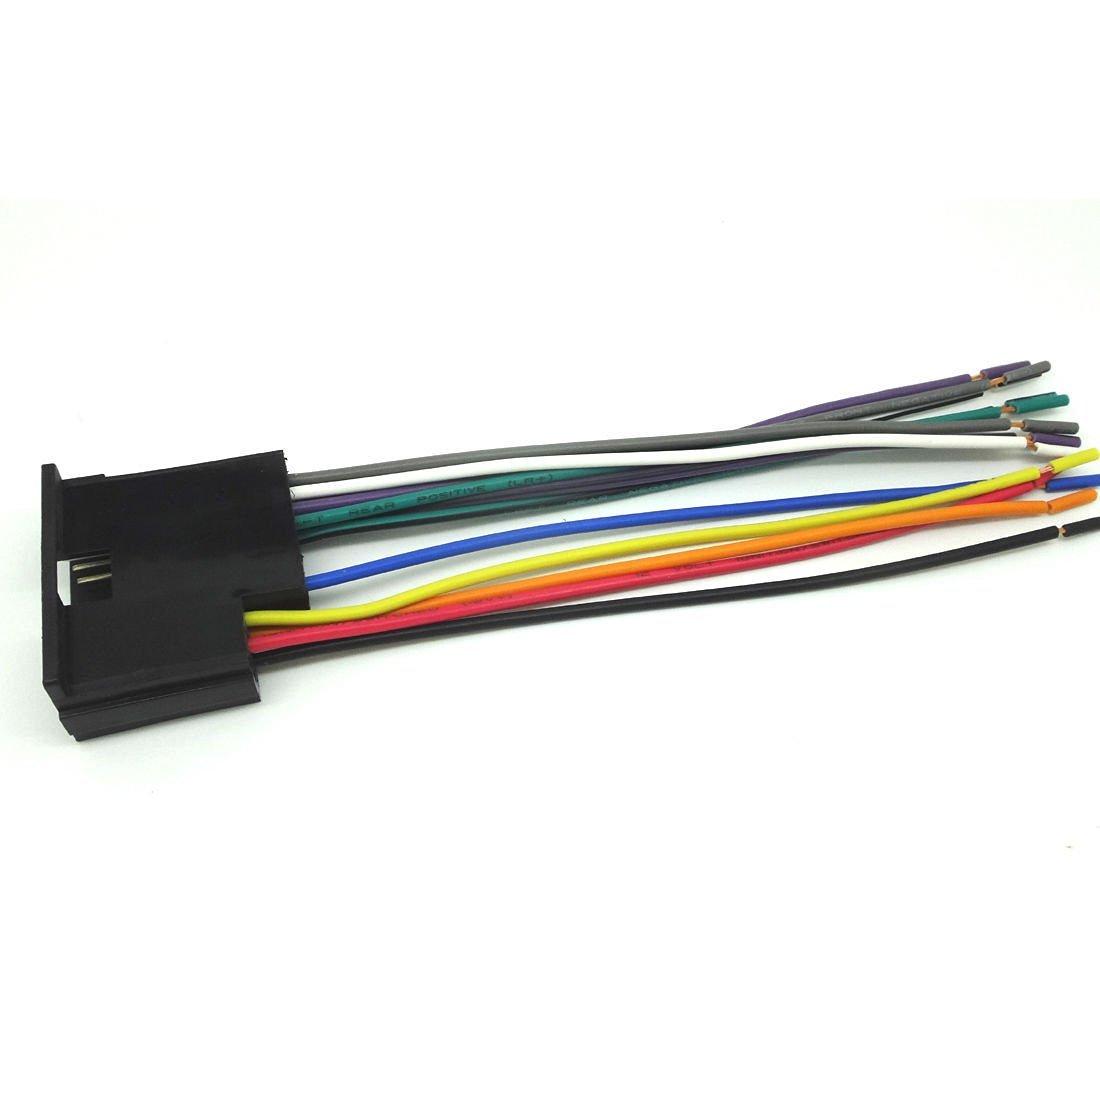 buy conpus car stereo cd player wiring harness wire aftermarket kia spectra conpus car stereo cd player wiring harness wire aftermarket radio install 1996 2002 kia sportage